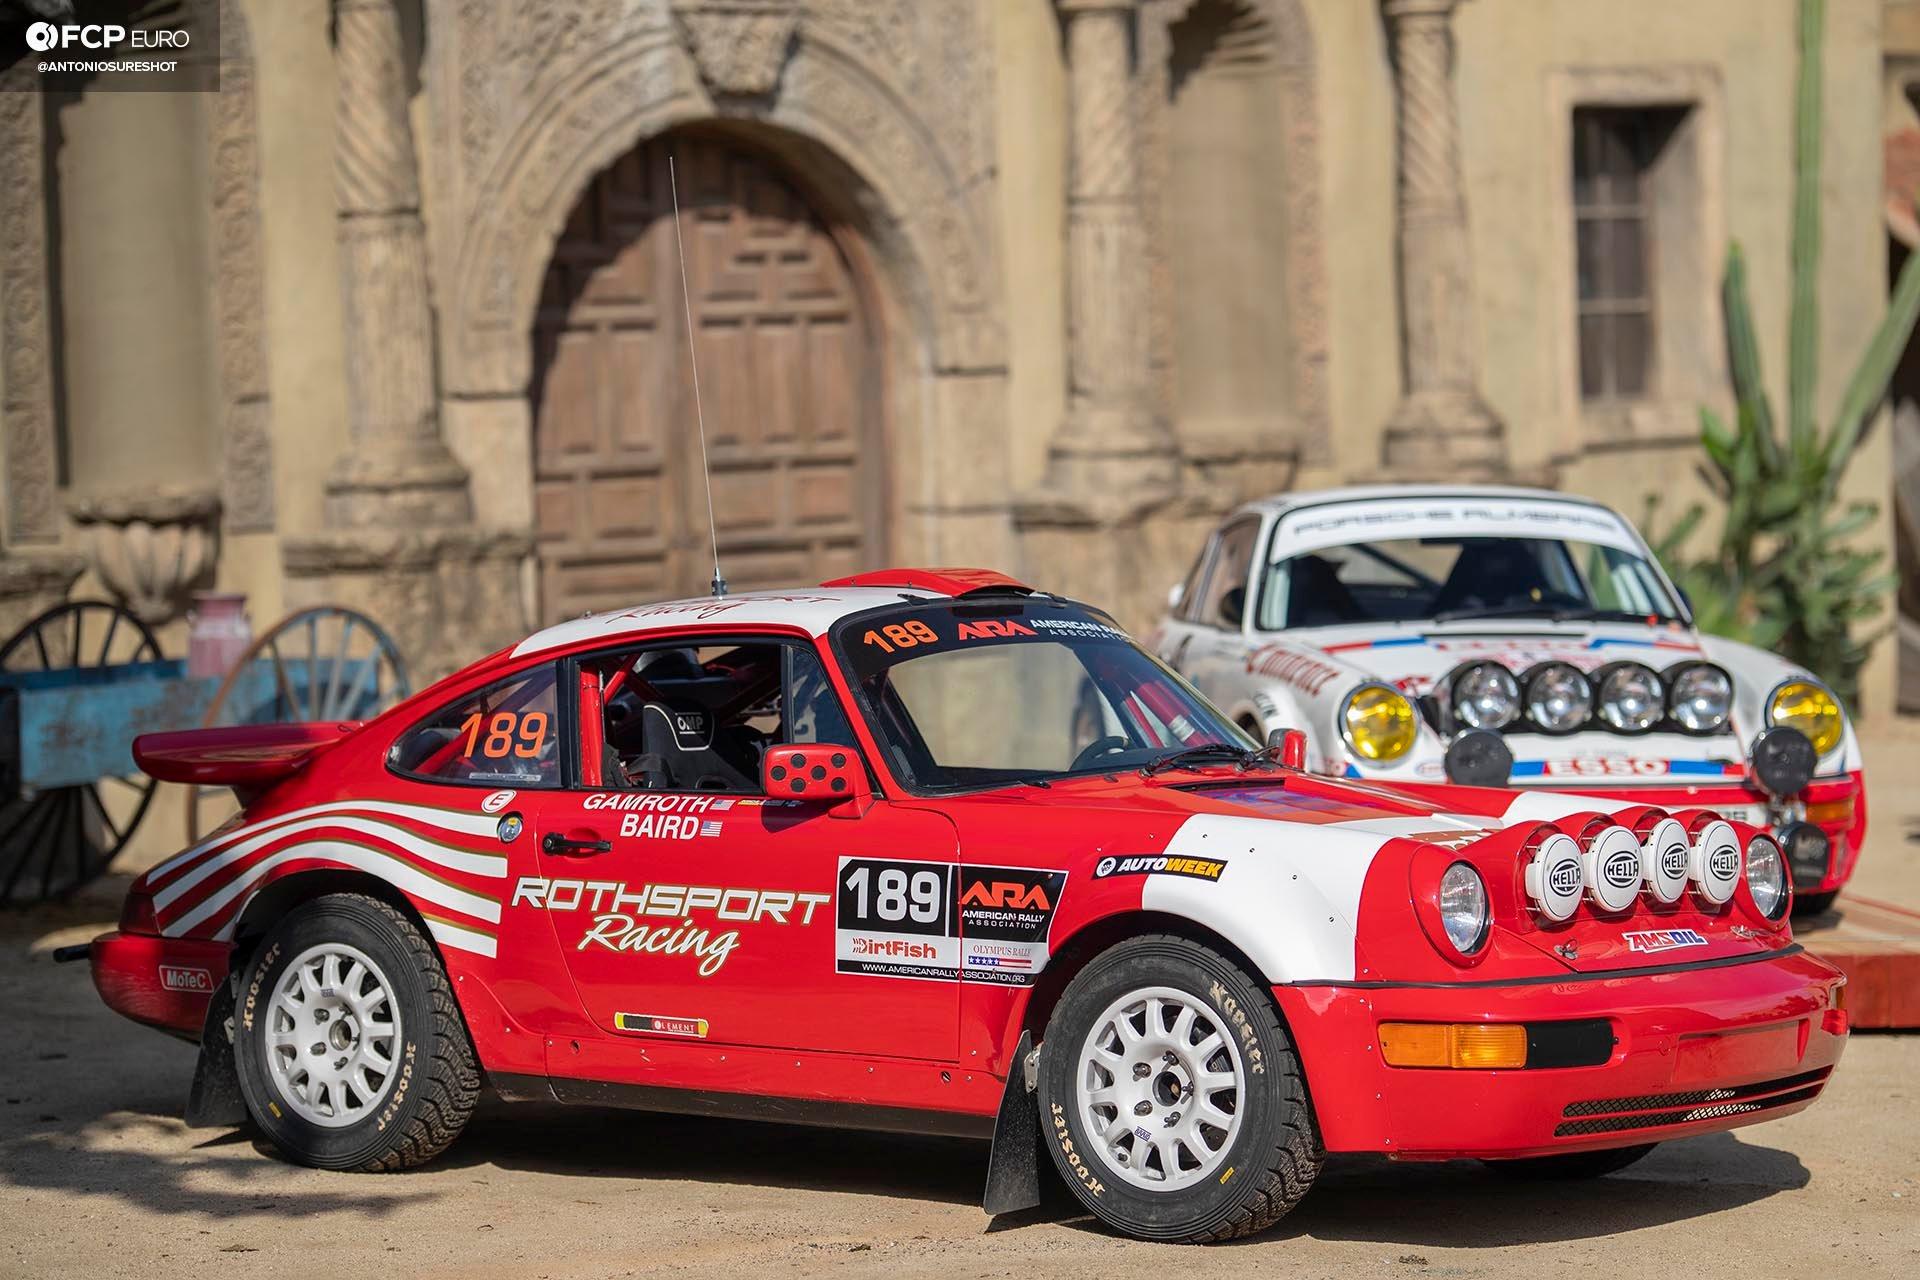 Safari 964 Rothsport Racing Porsche 911 Rally Car Mexican 1000 Luftgekuhlt Olympus Rally